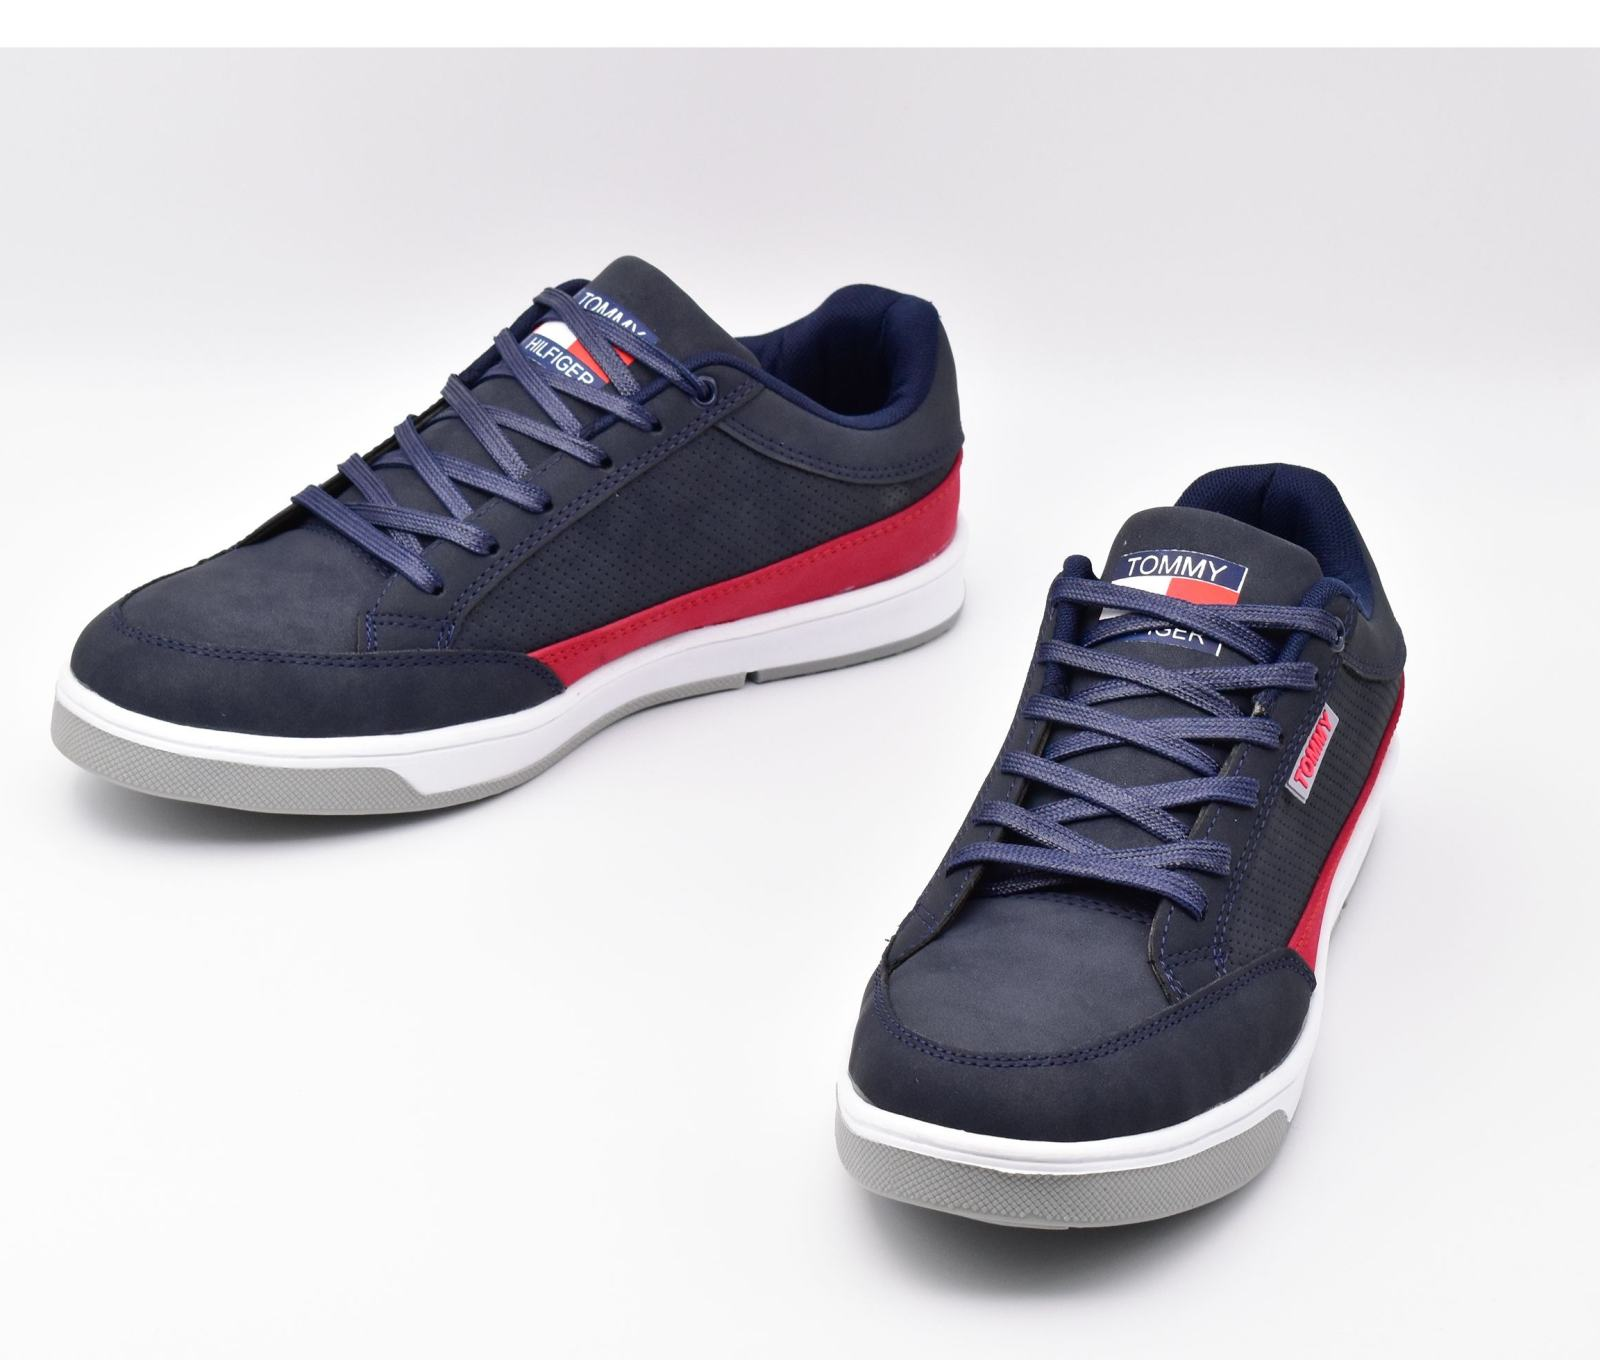 کفش روزمره مردانه مدل رهاورد کد 5513 -  - 5